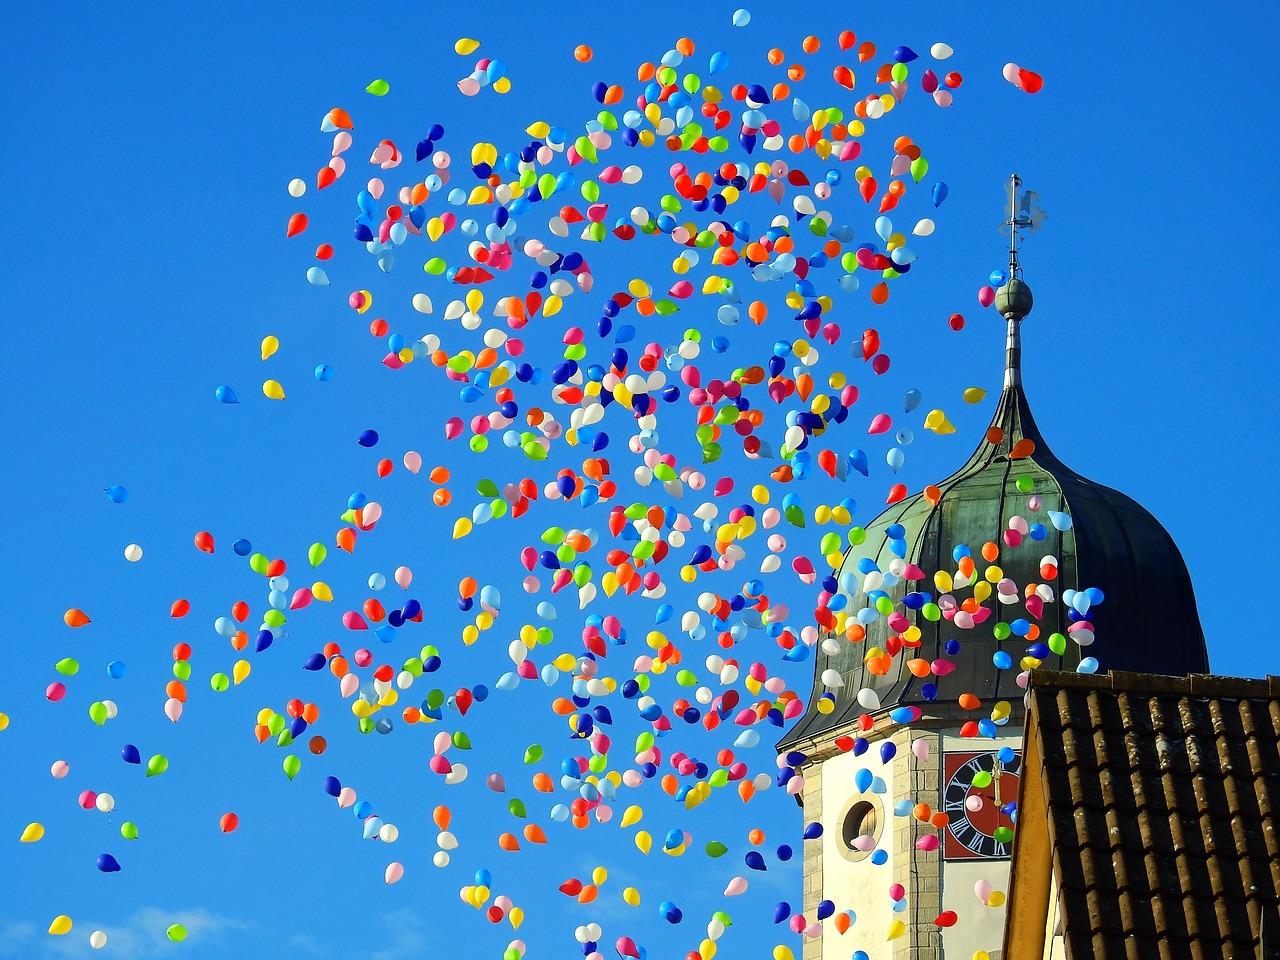 Bunte Ballons werden steigen gelassen